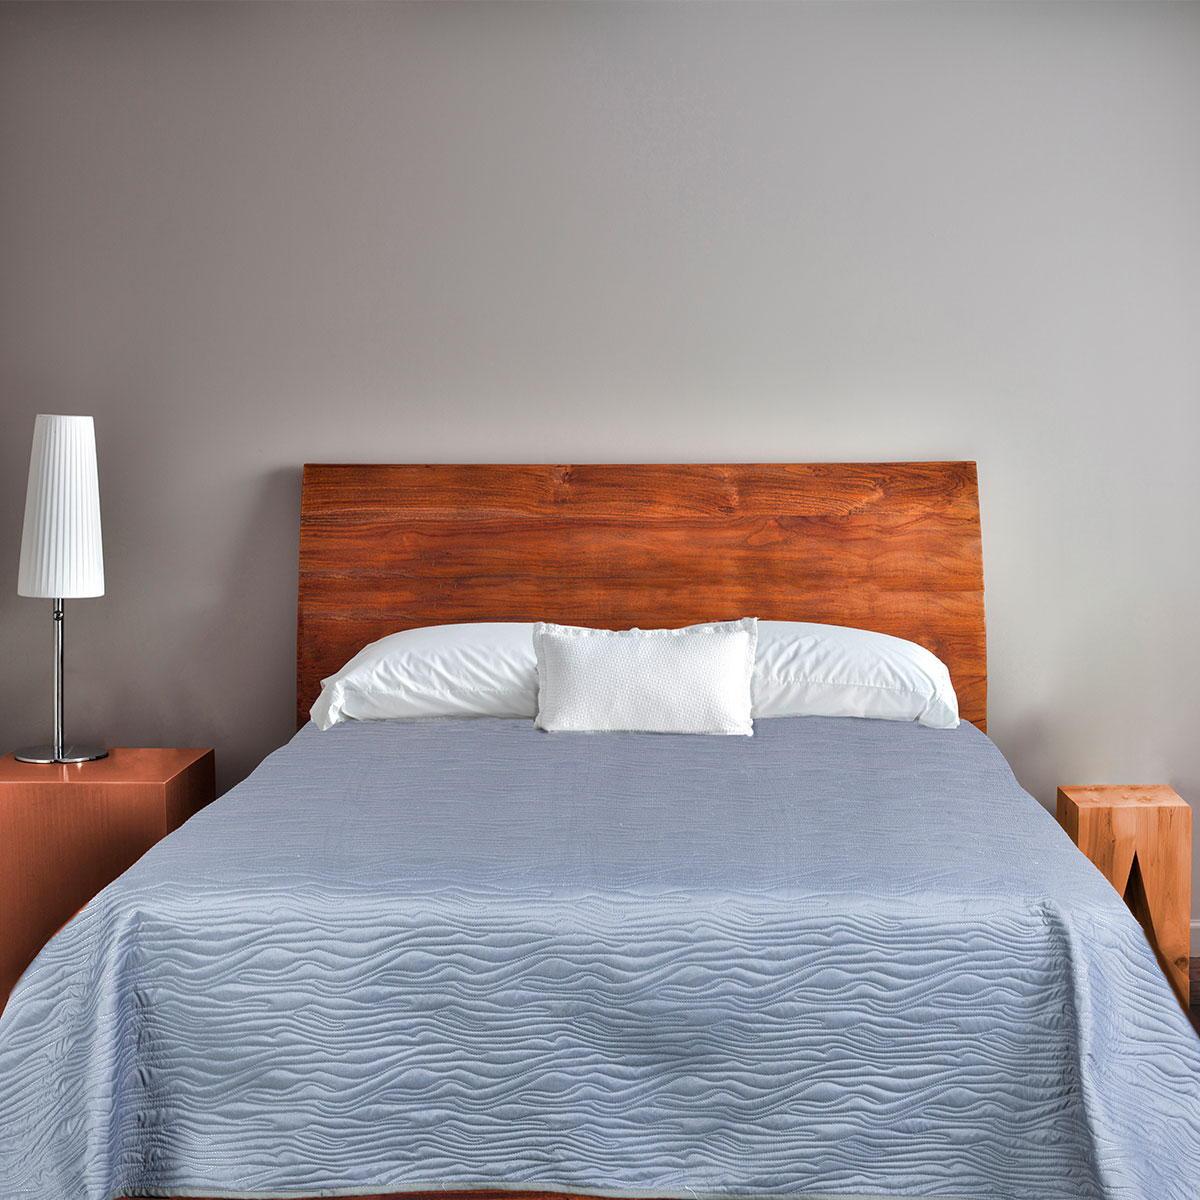 jet de lit paddle matelass standard textile. Black Bedroom Furniture Sets. Home Design Ideas